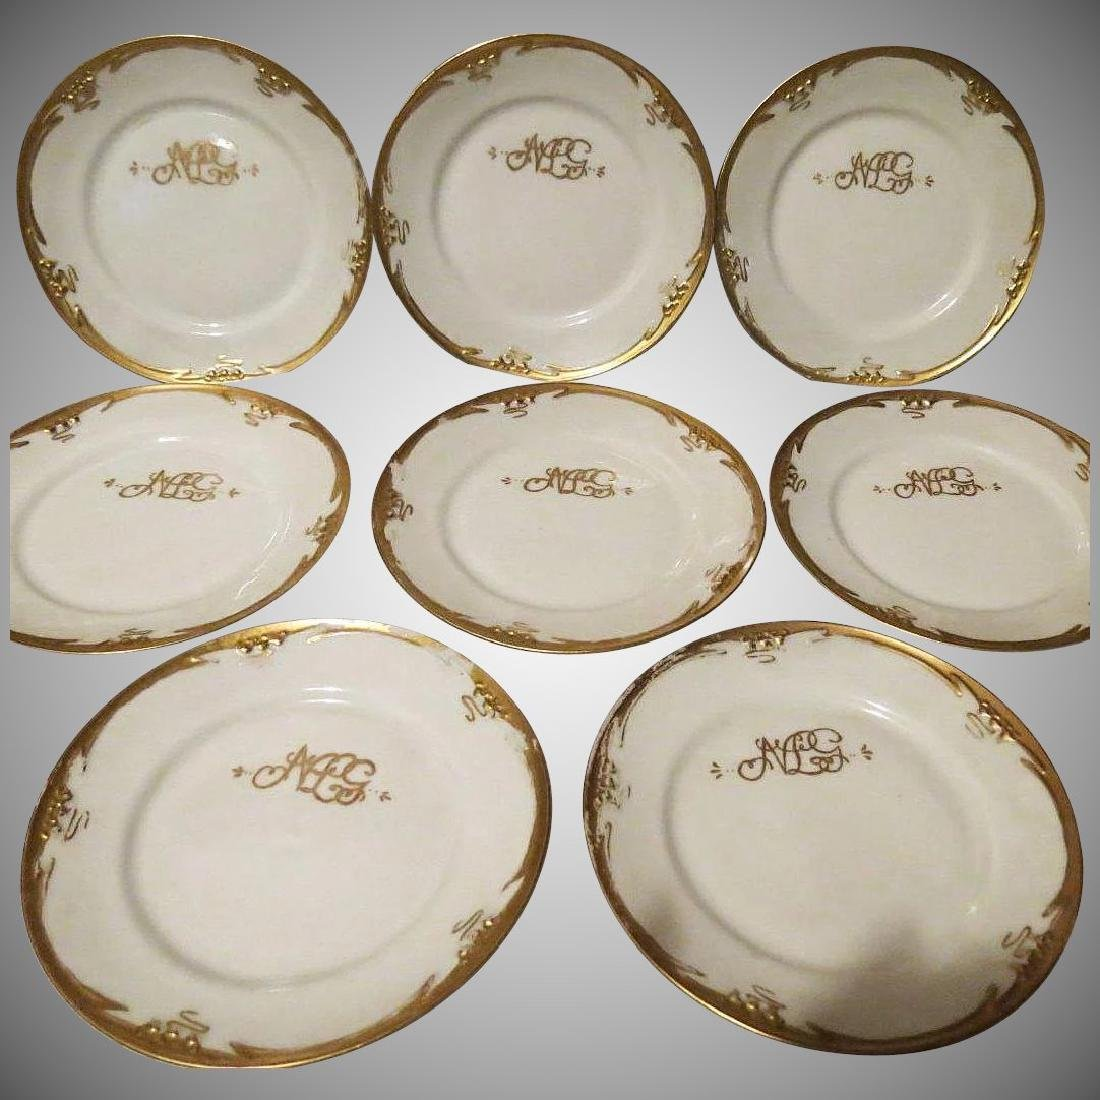 Antique P Mavaleix Limoges France china 8 lunch plates